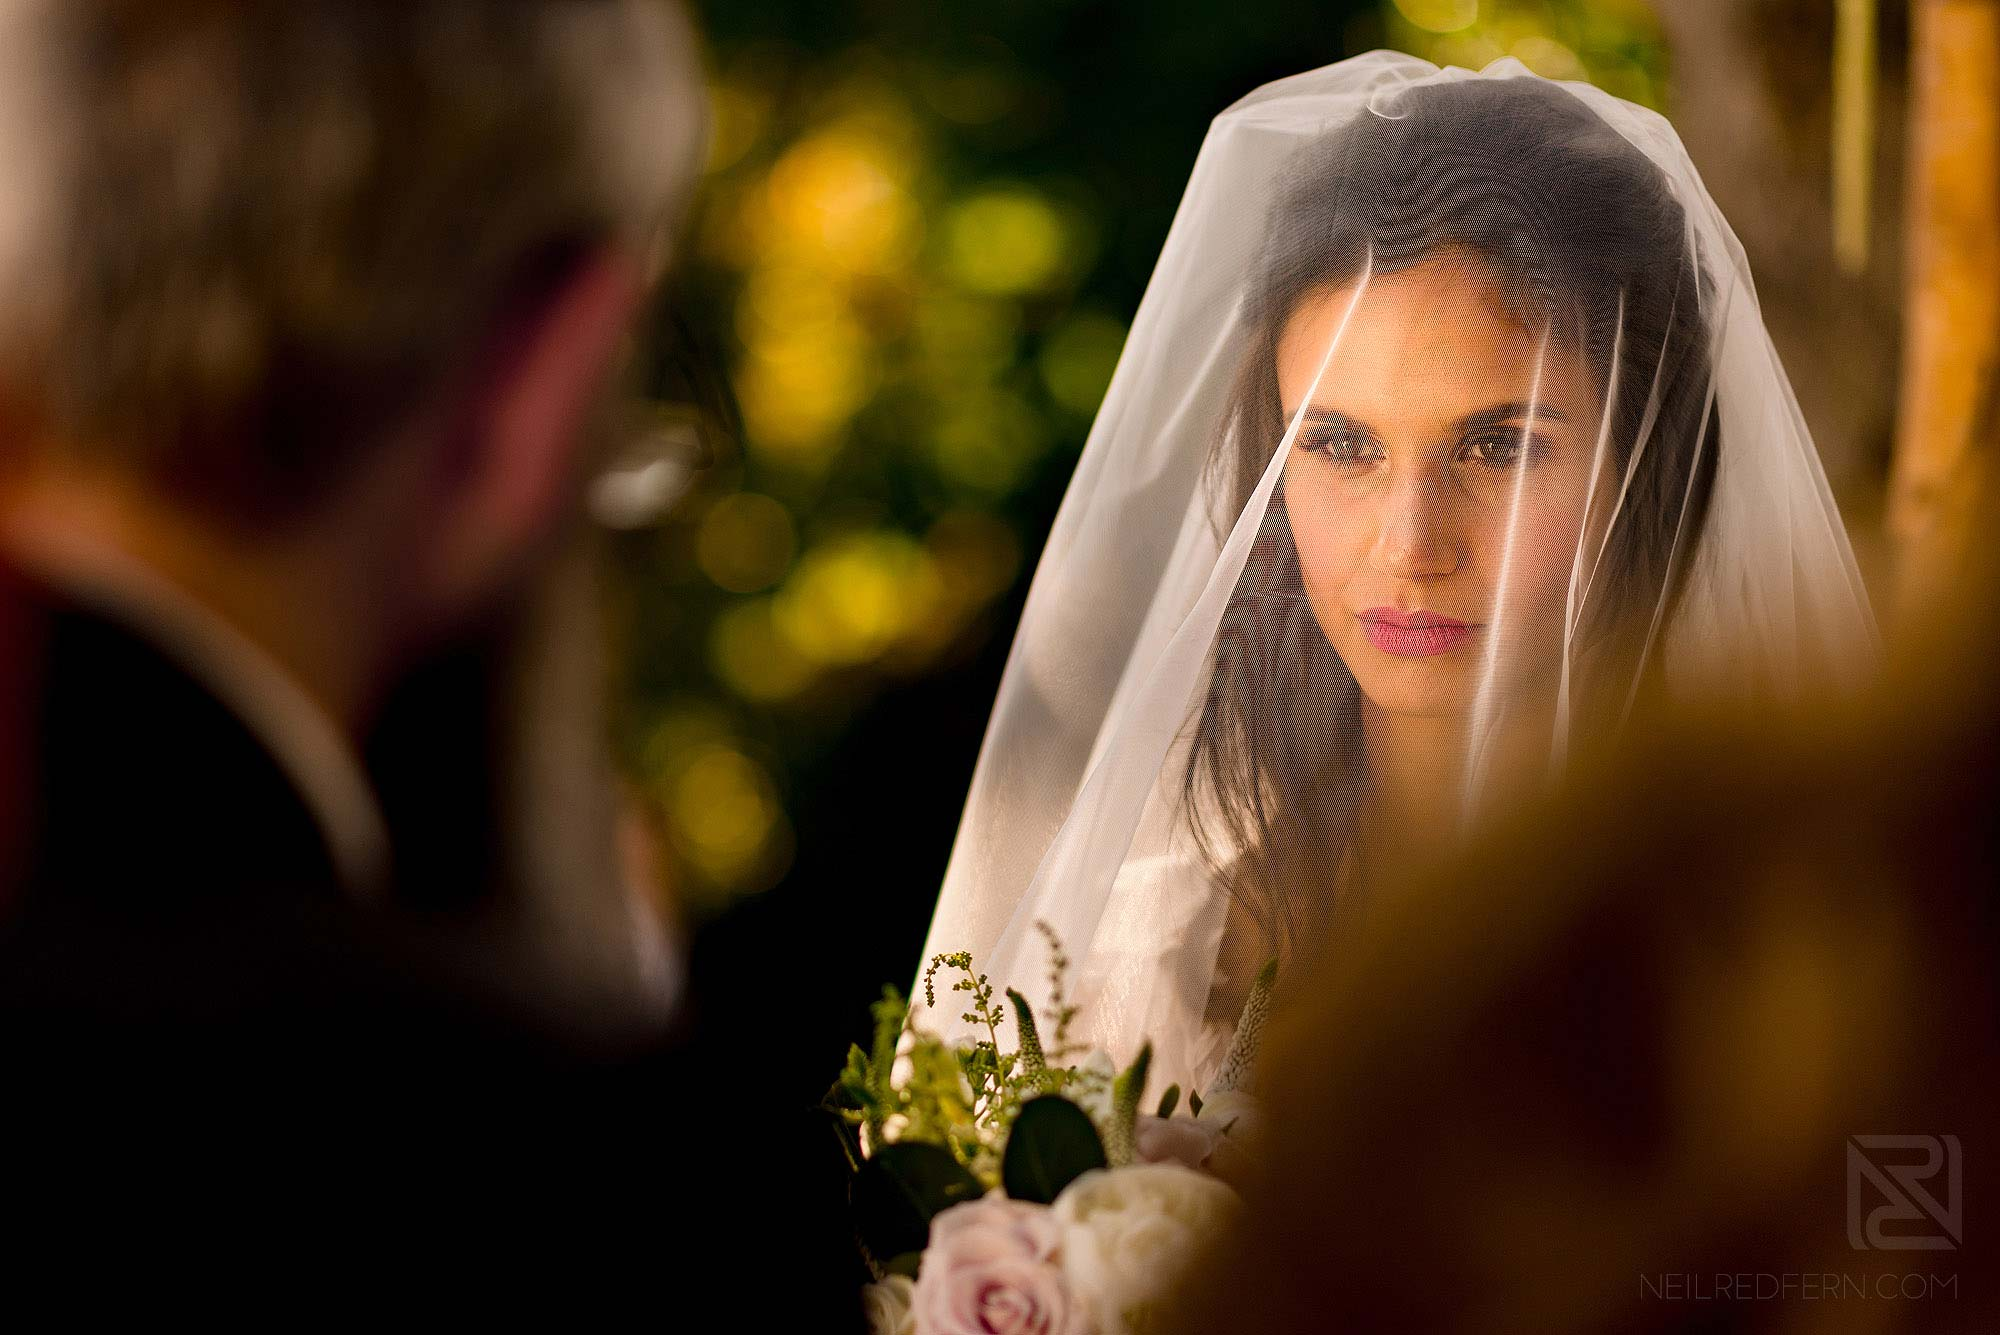 Jewish bride looking at Rabbi during wedding ceremony